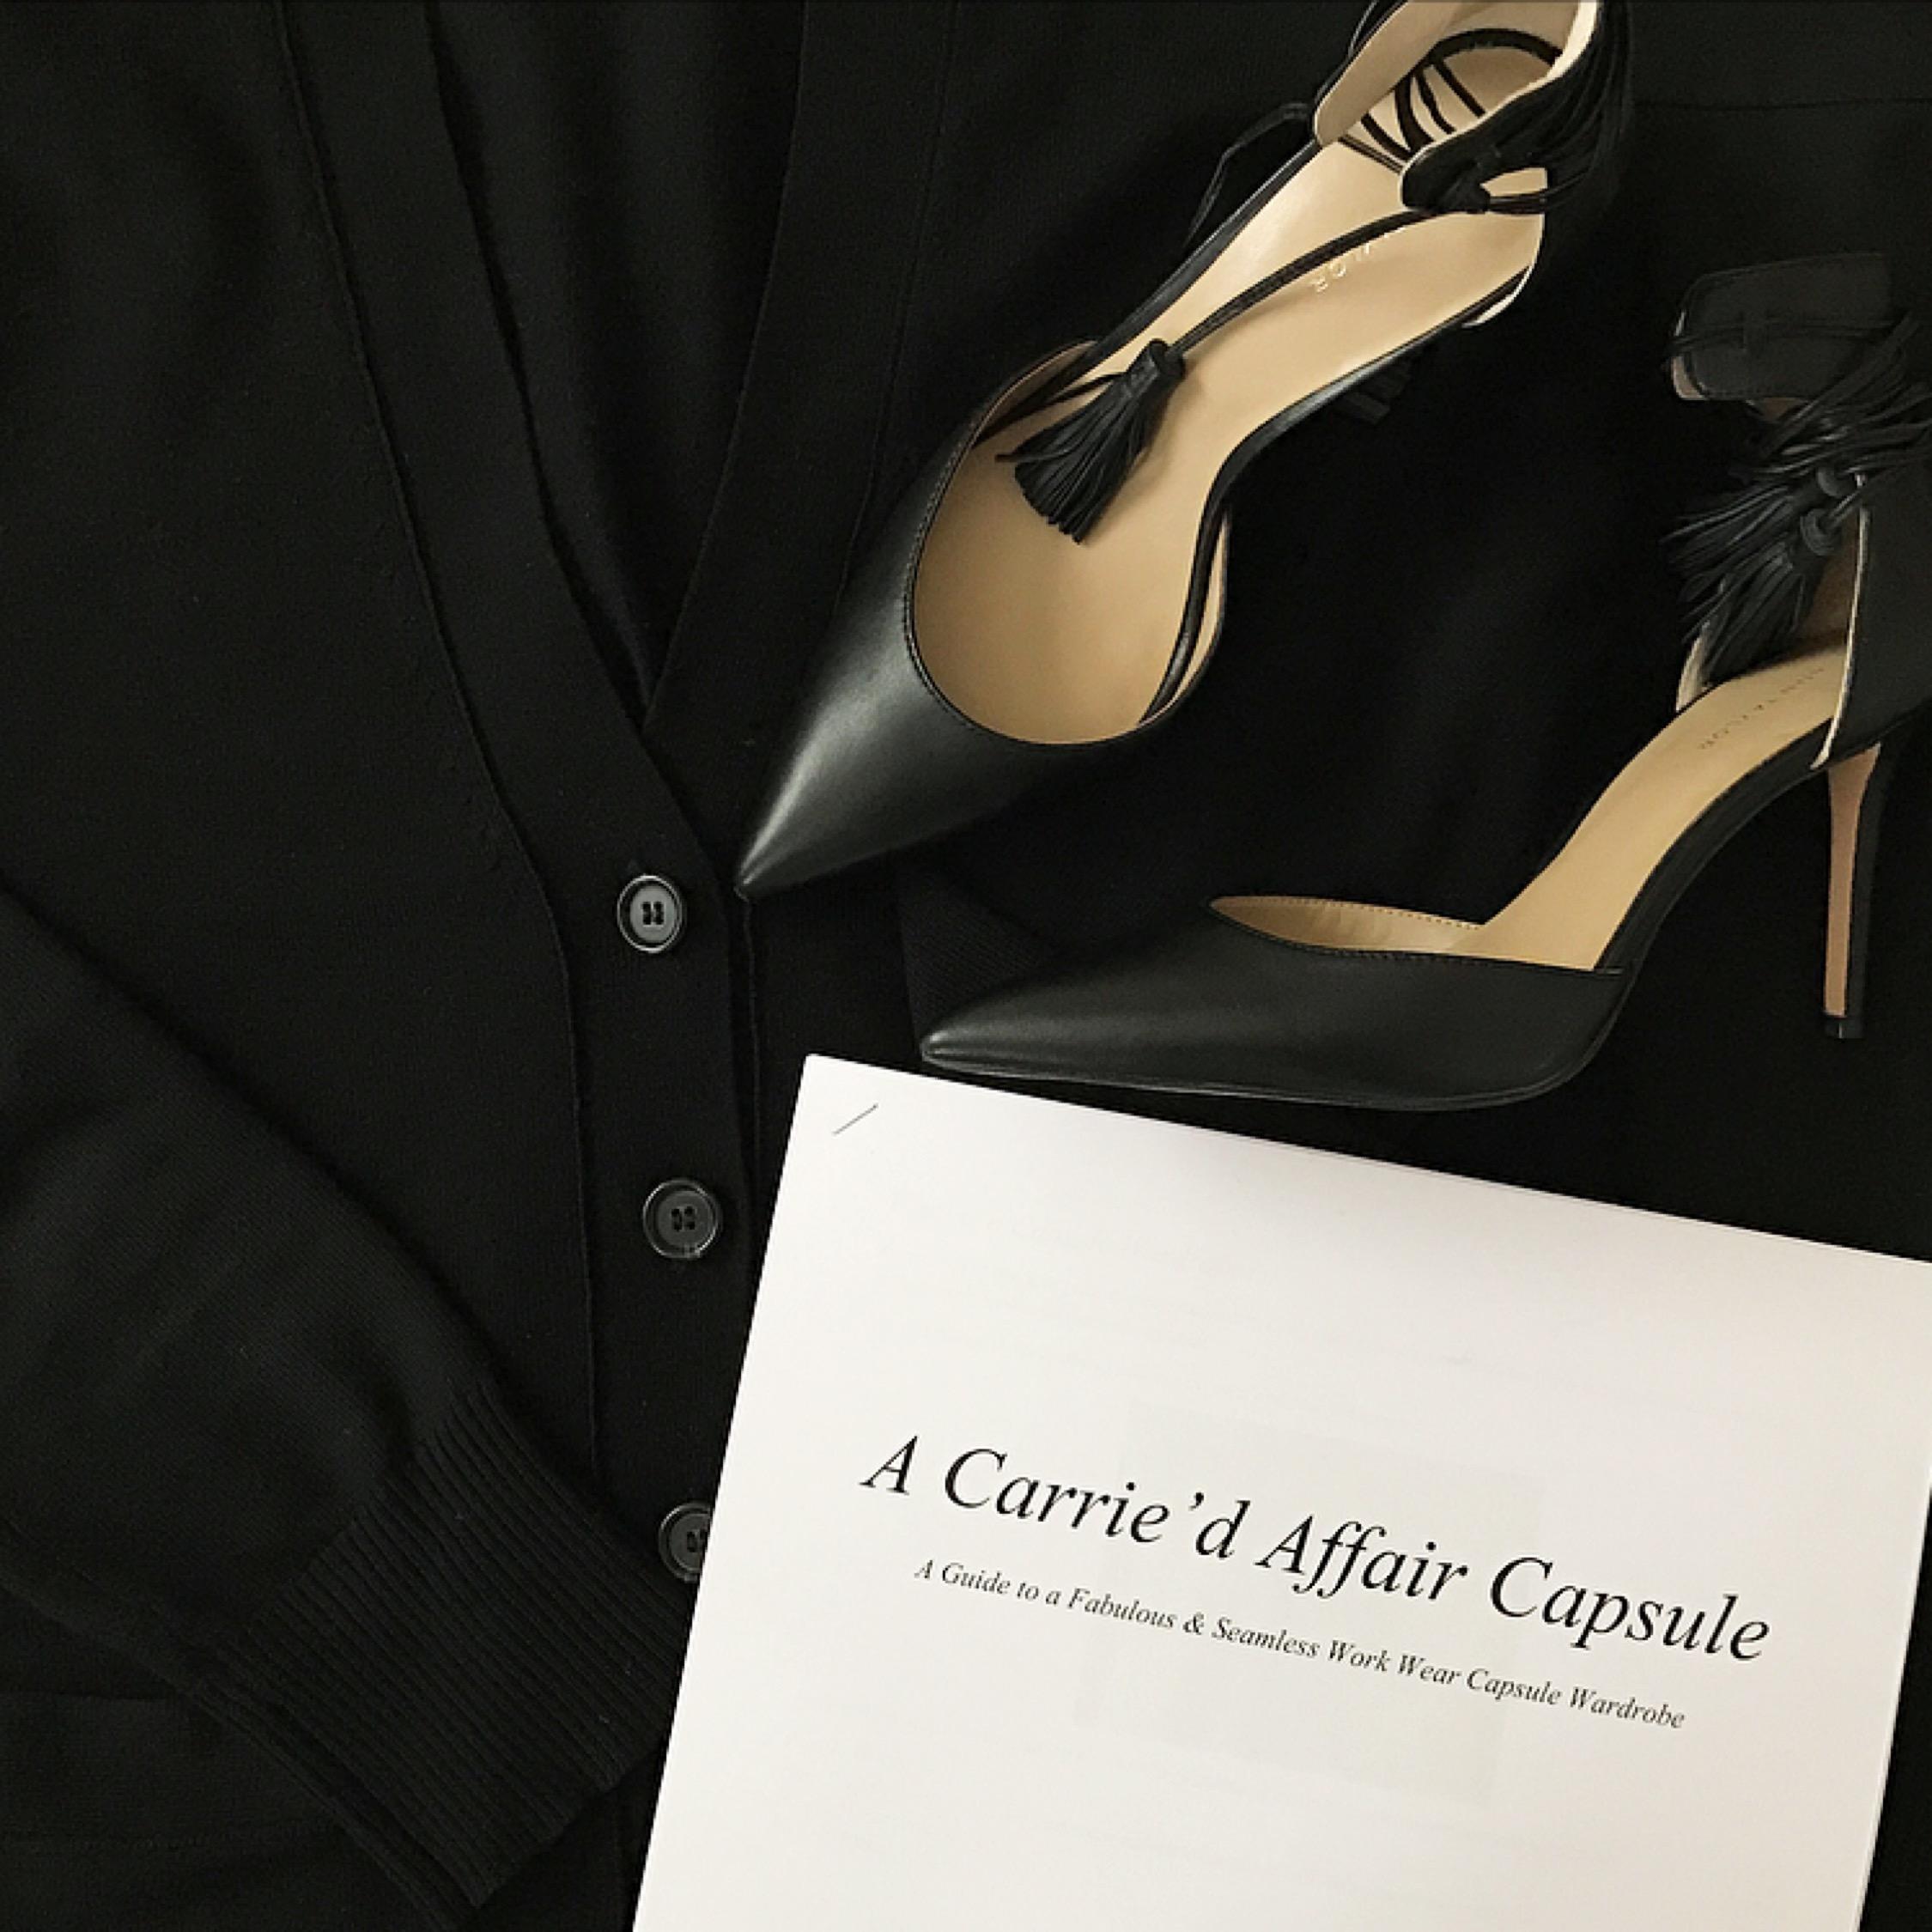 97932aeca3 Work Wear Capsule Wardrobe – Part 2 – A Carrie d Affair Blog